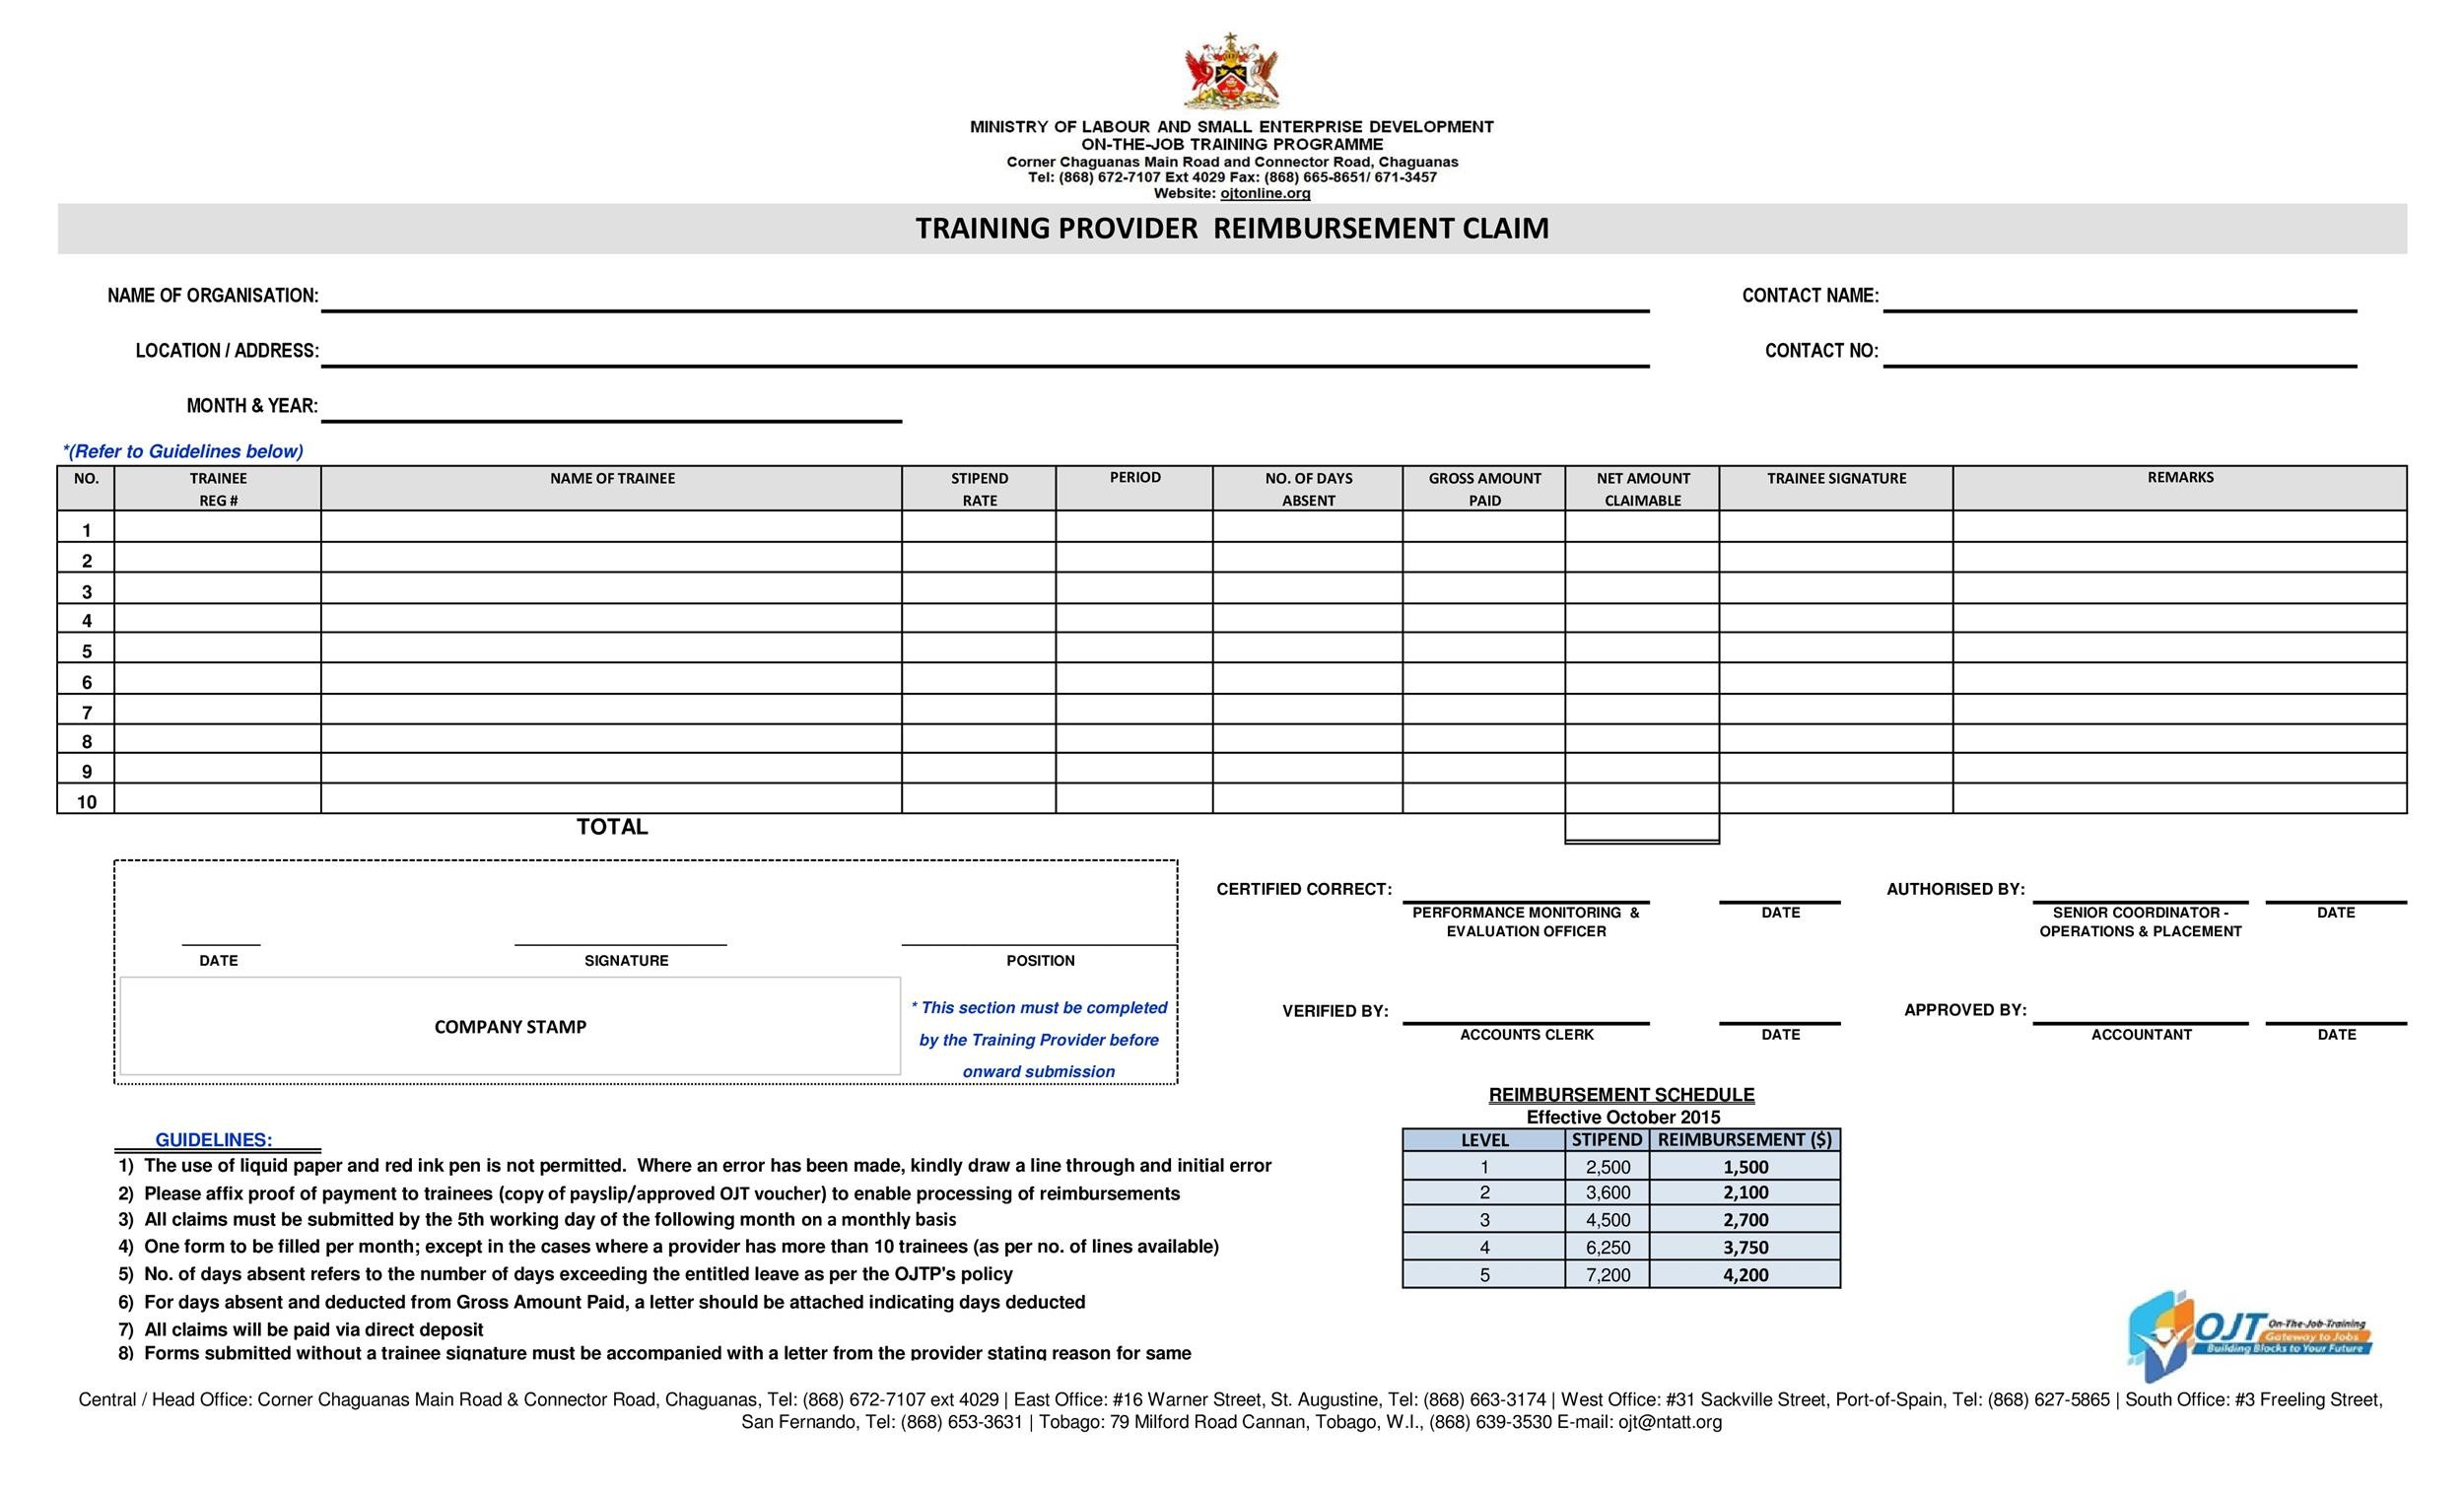 47 Reimbursement Form Templates Mileage, Expense, VSP - reimbursement form